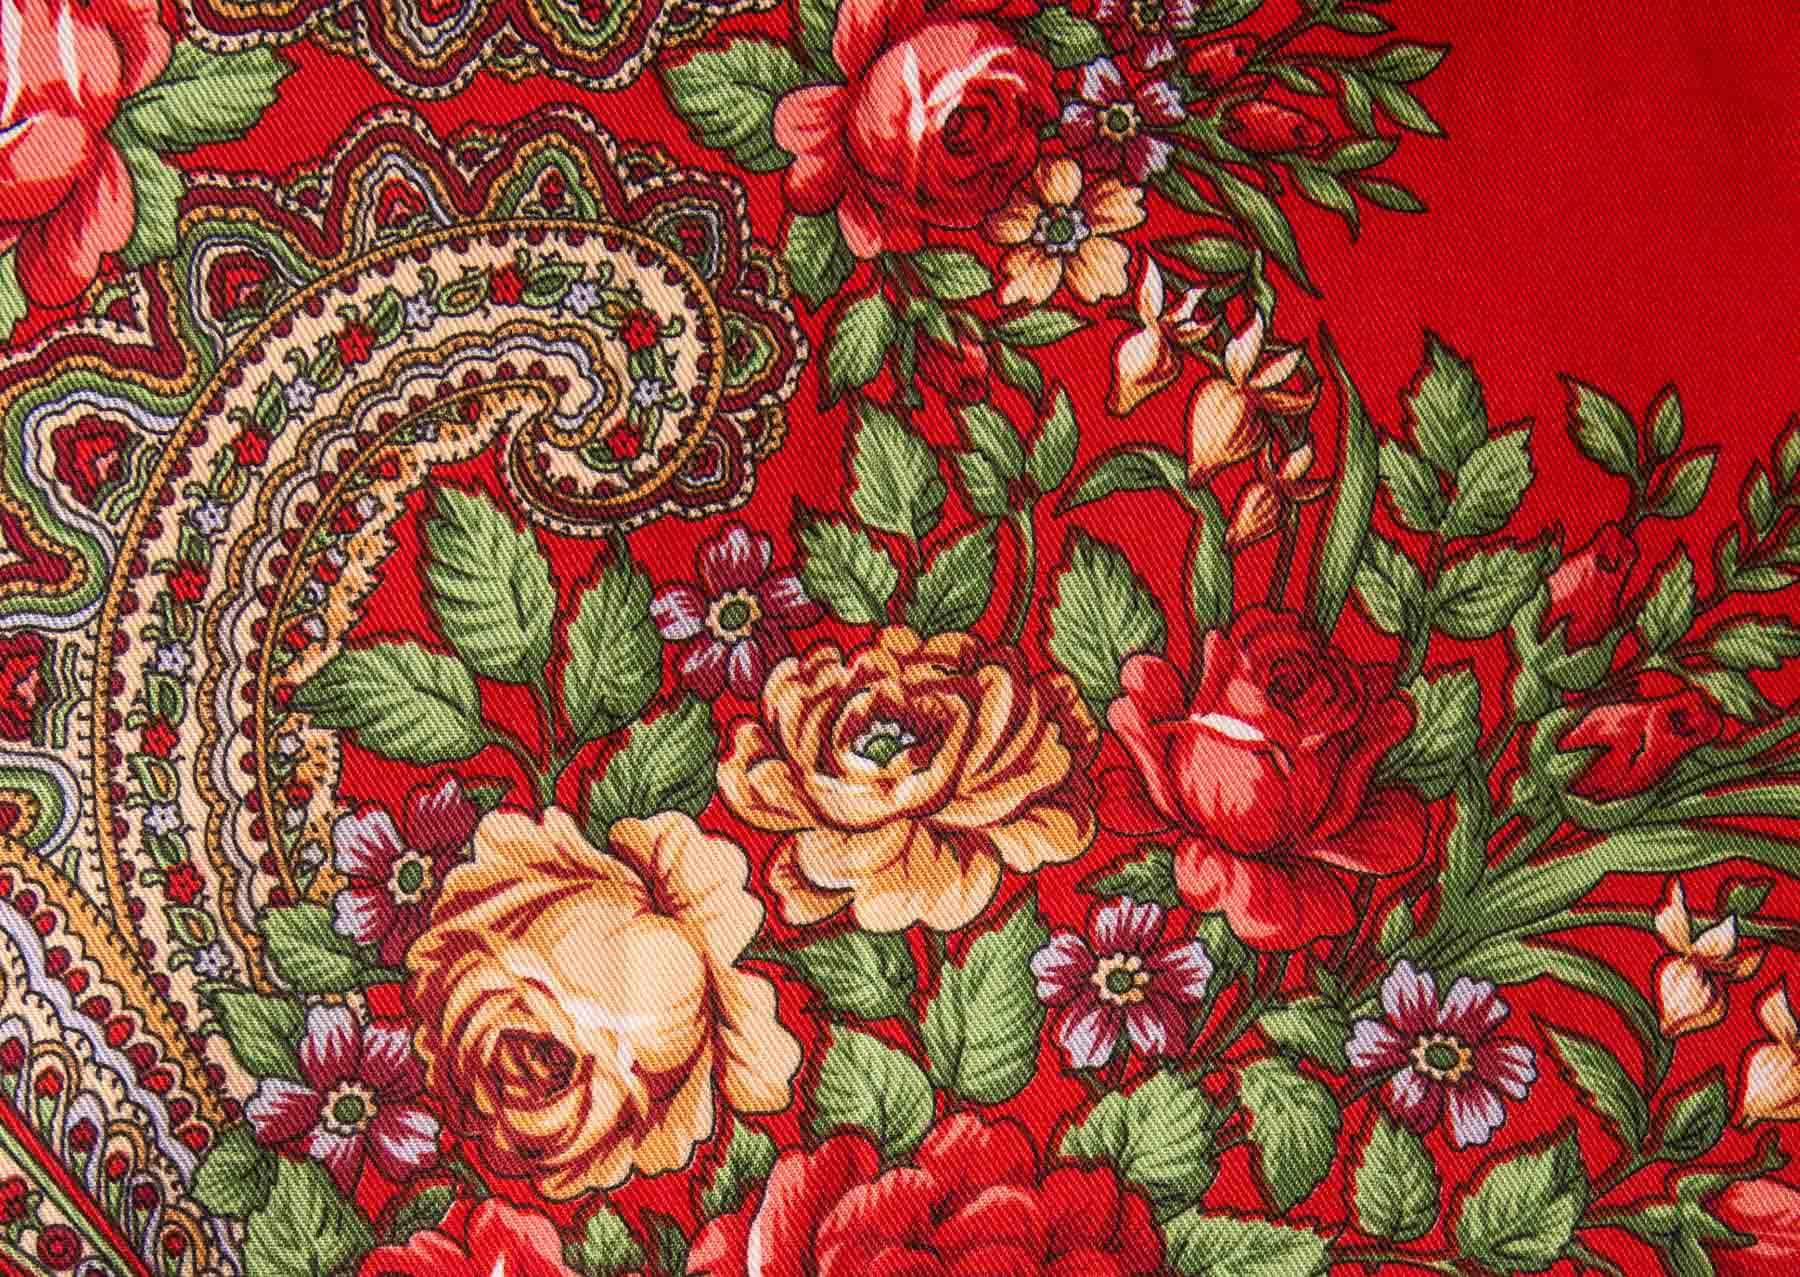 Russian-style-fashion-photographer-london-floral-Русский-стиль-мода-павловопосадский-платок-natalia-smith-photography-0001.jpg